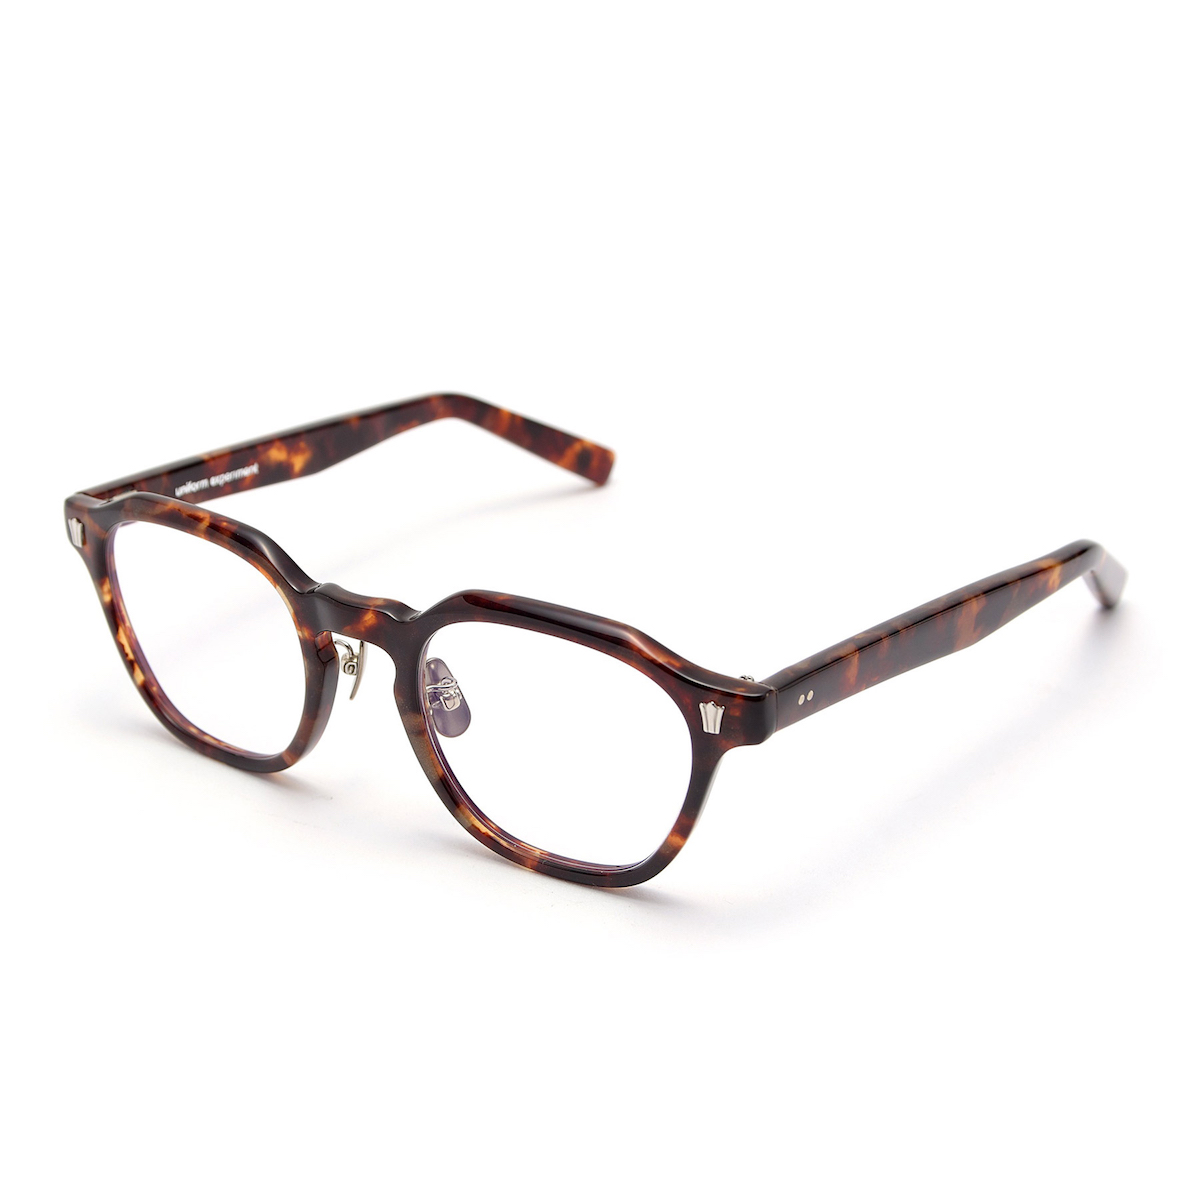 uniform experiment / 泰八郎 GLASSES -Brown